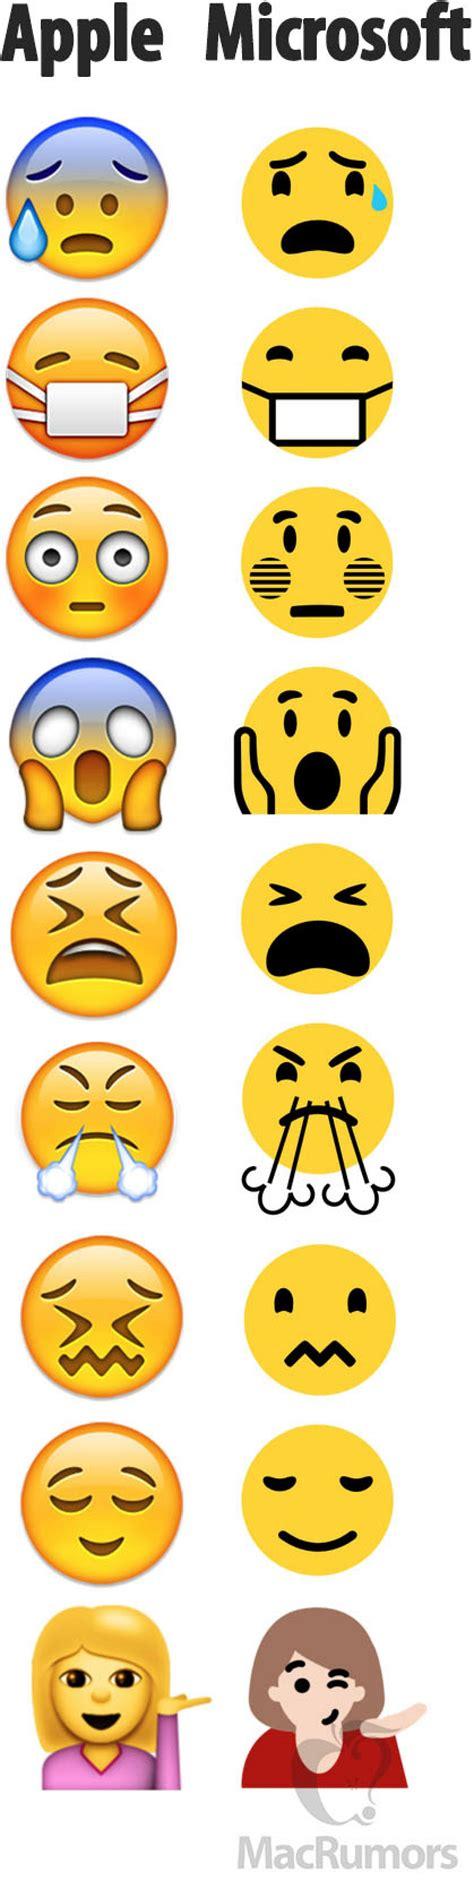 how to update the emoji 2015 microsoft updates windows 10 emoji to resemble apple s